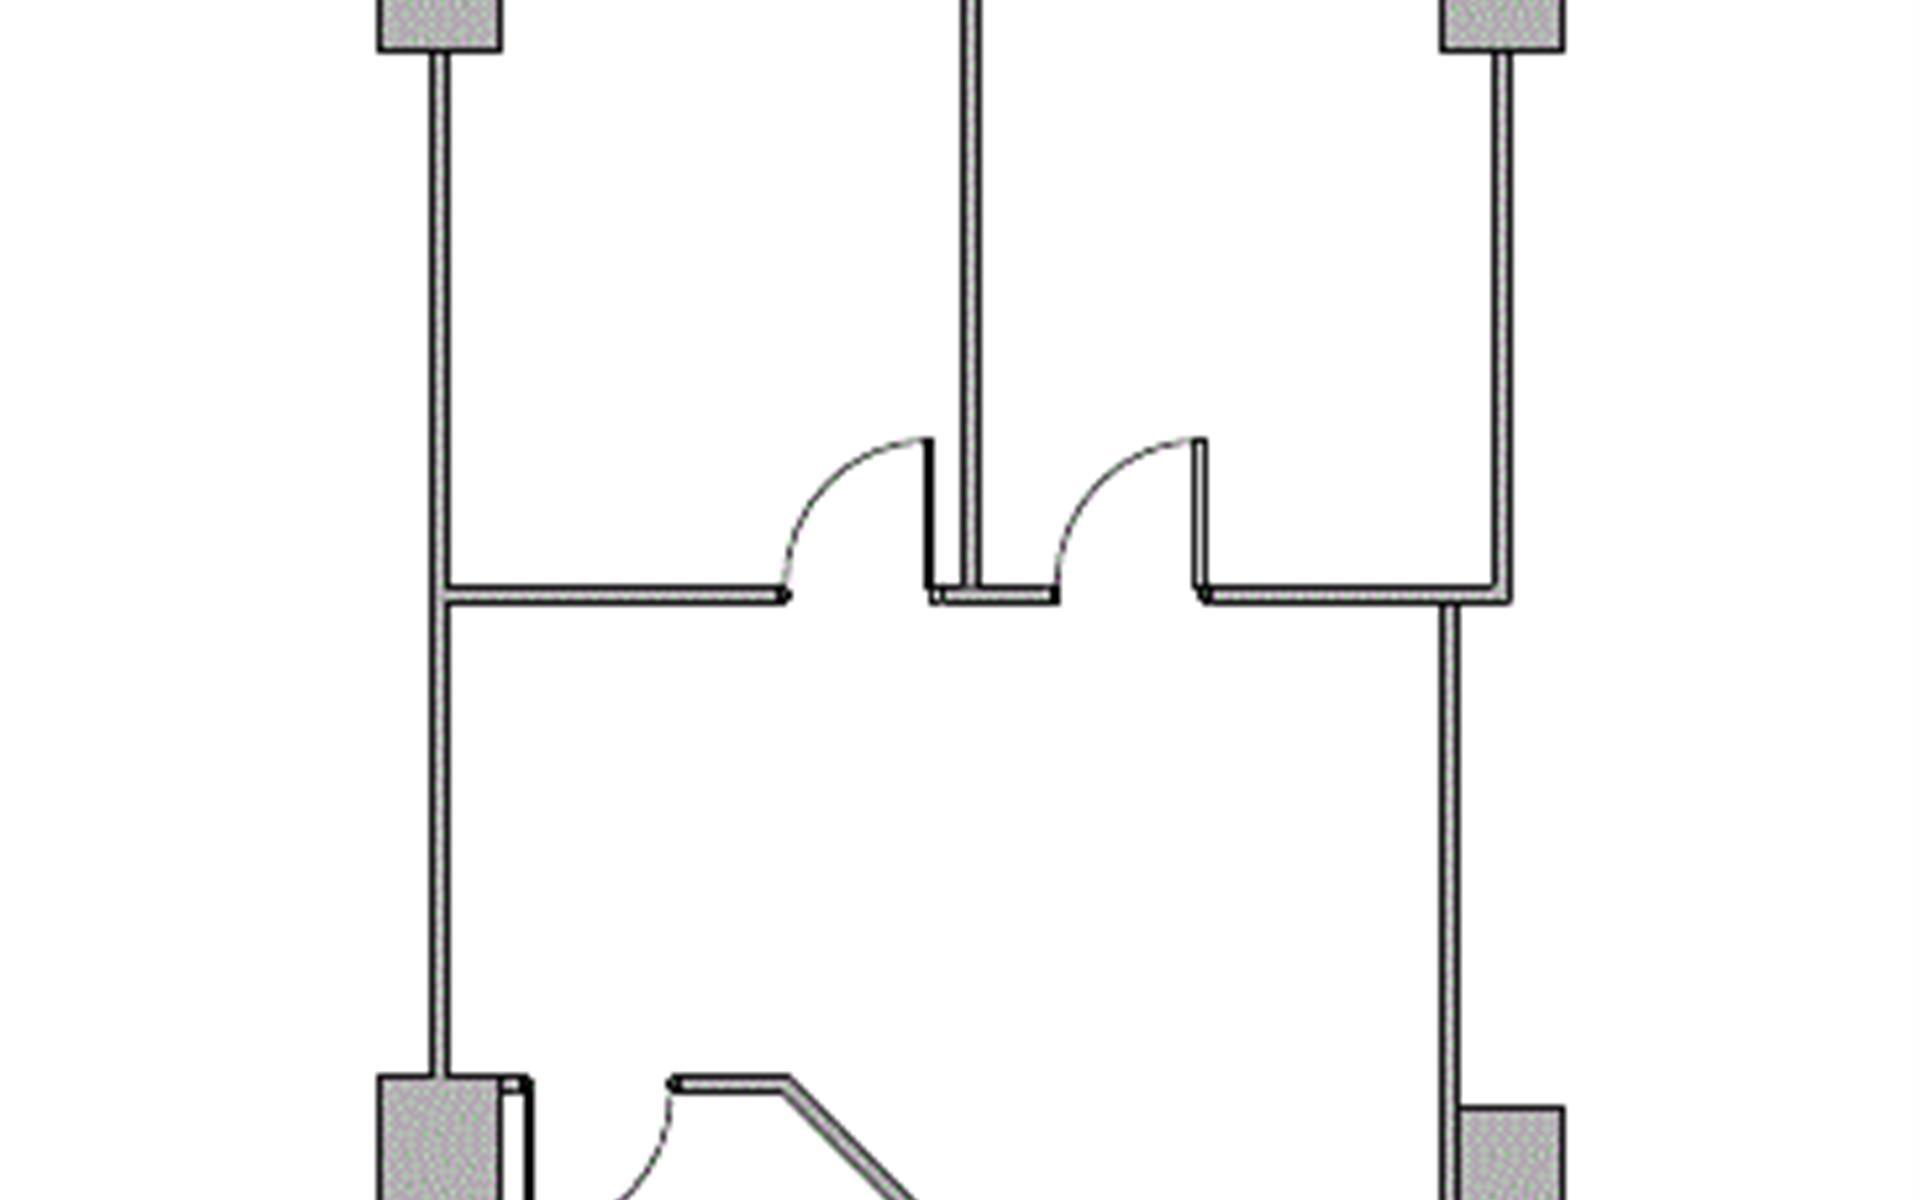 Boxer - Pavilion Towers - Boxer - Pavilion Towers